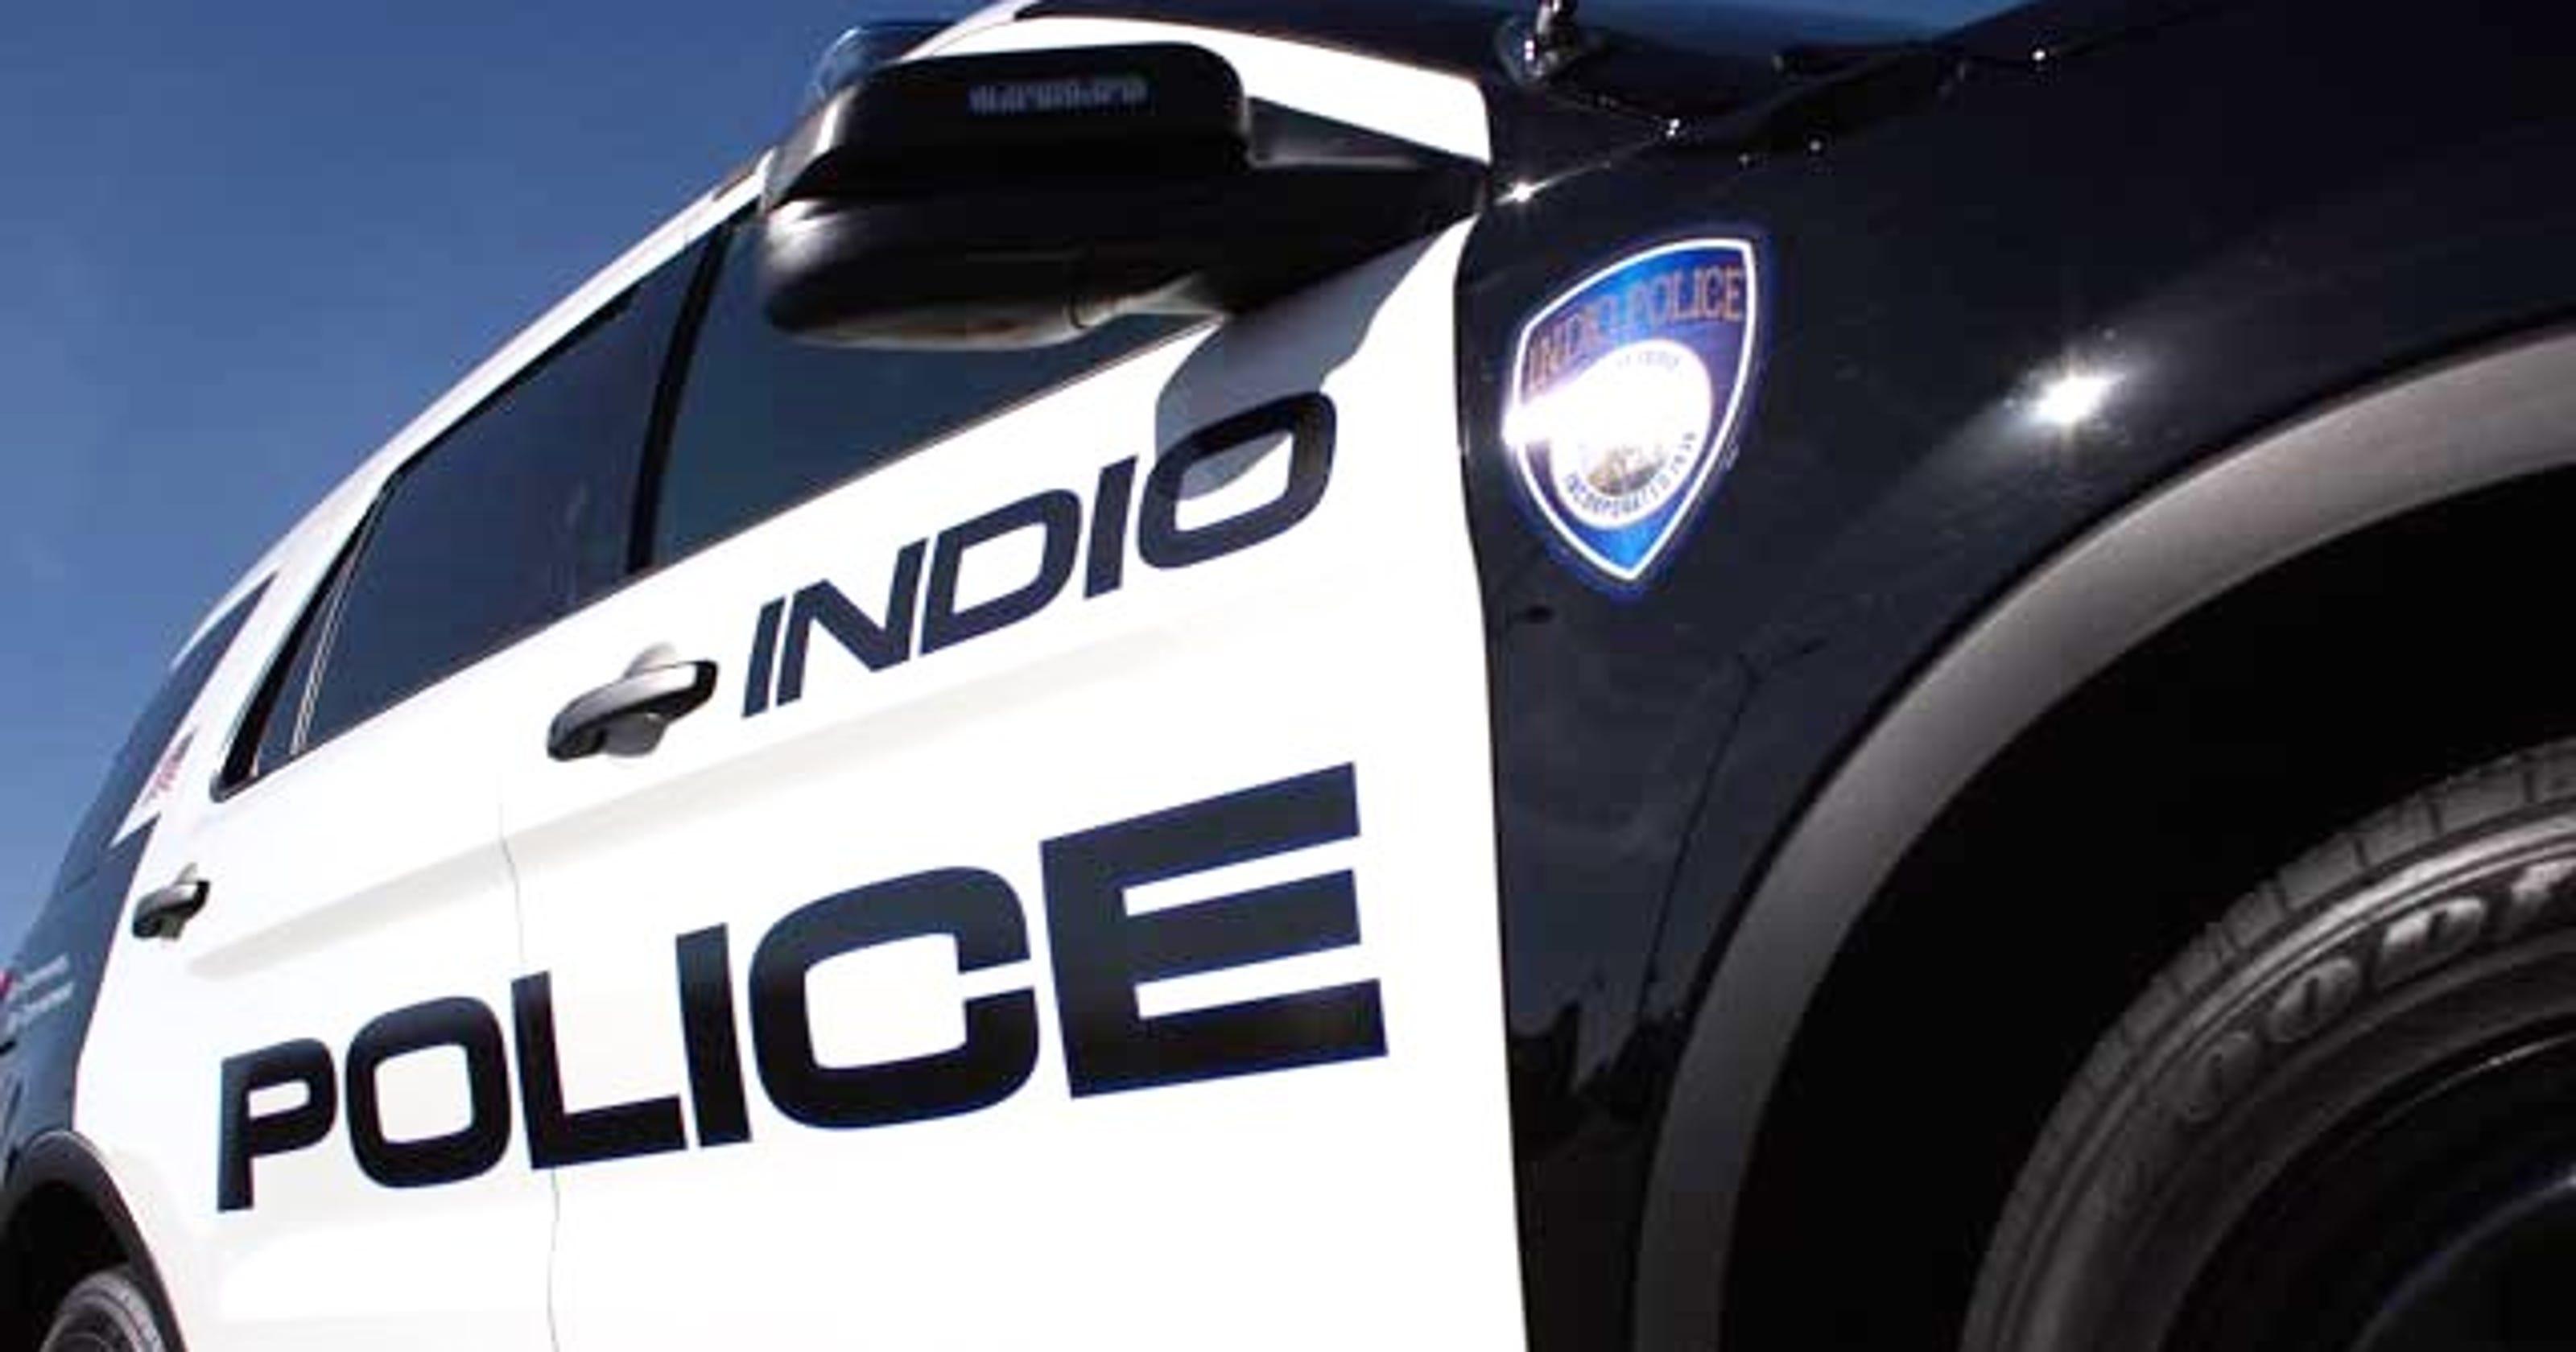 Indio police activity puts schools on lockdown